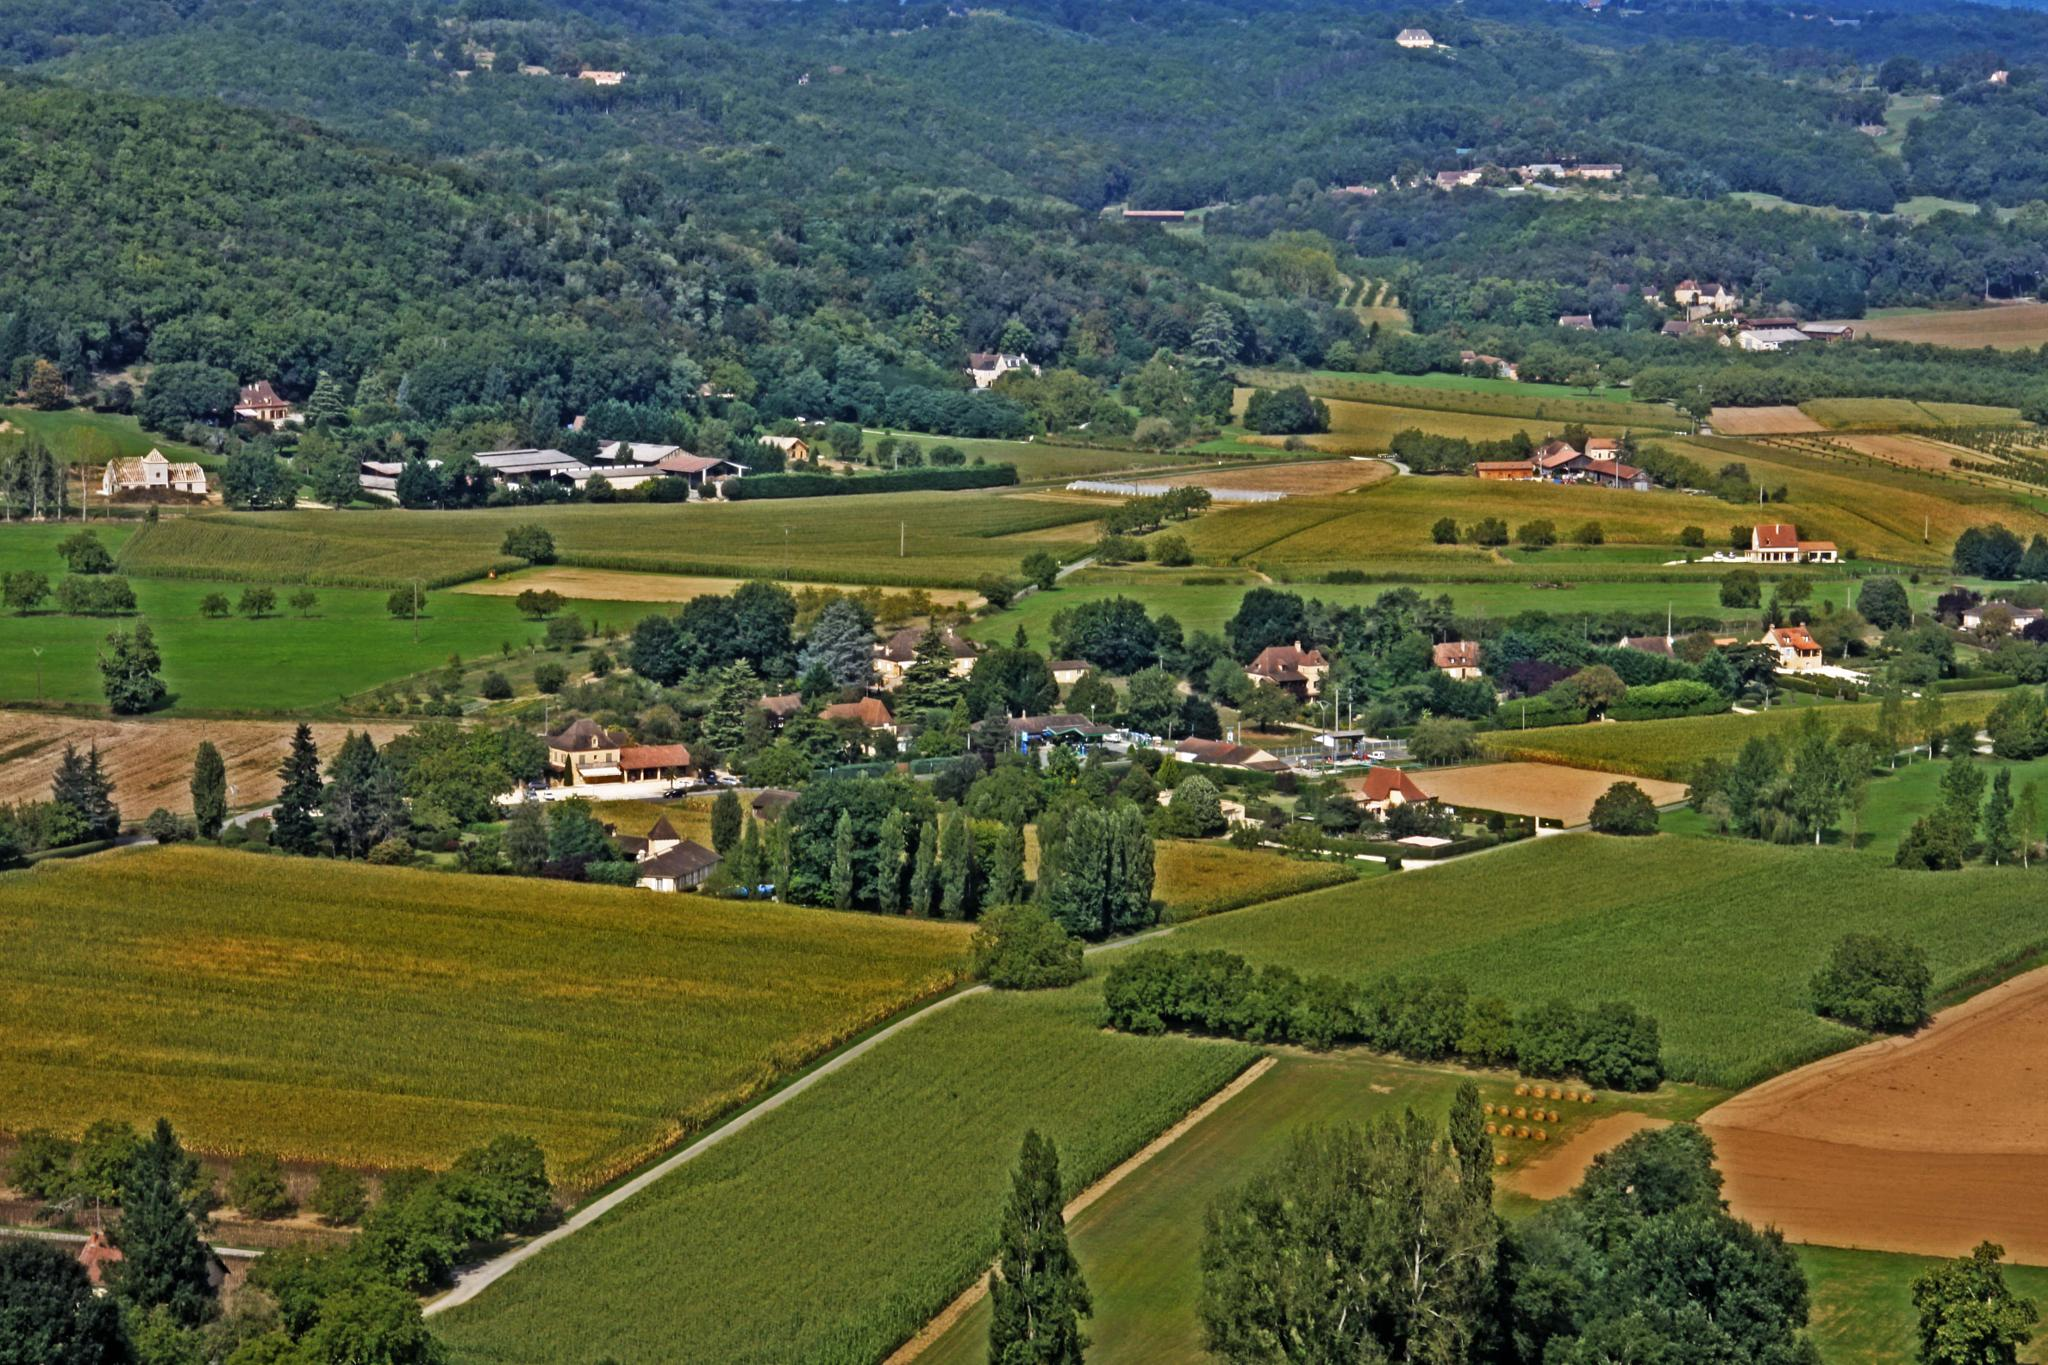 Dordogne landscape by mamstudio